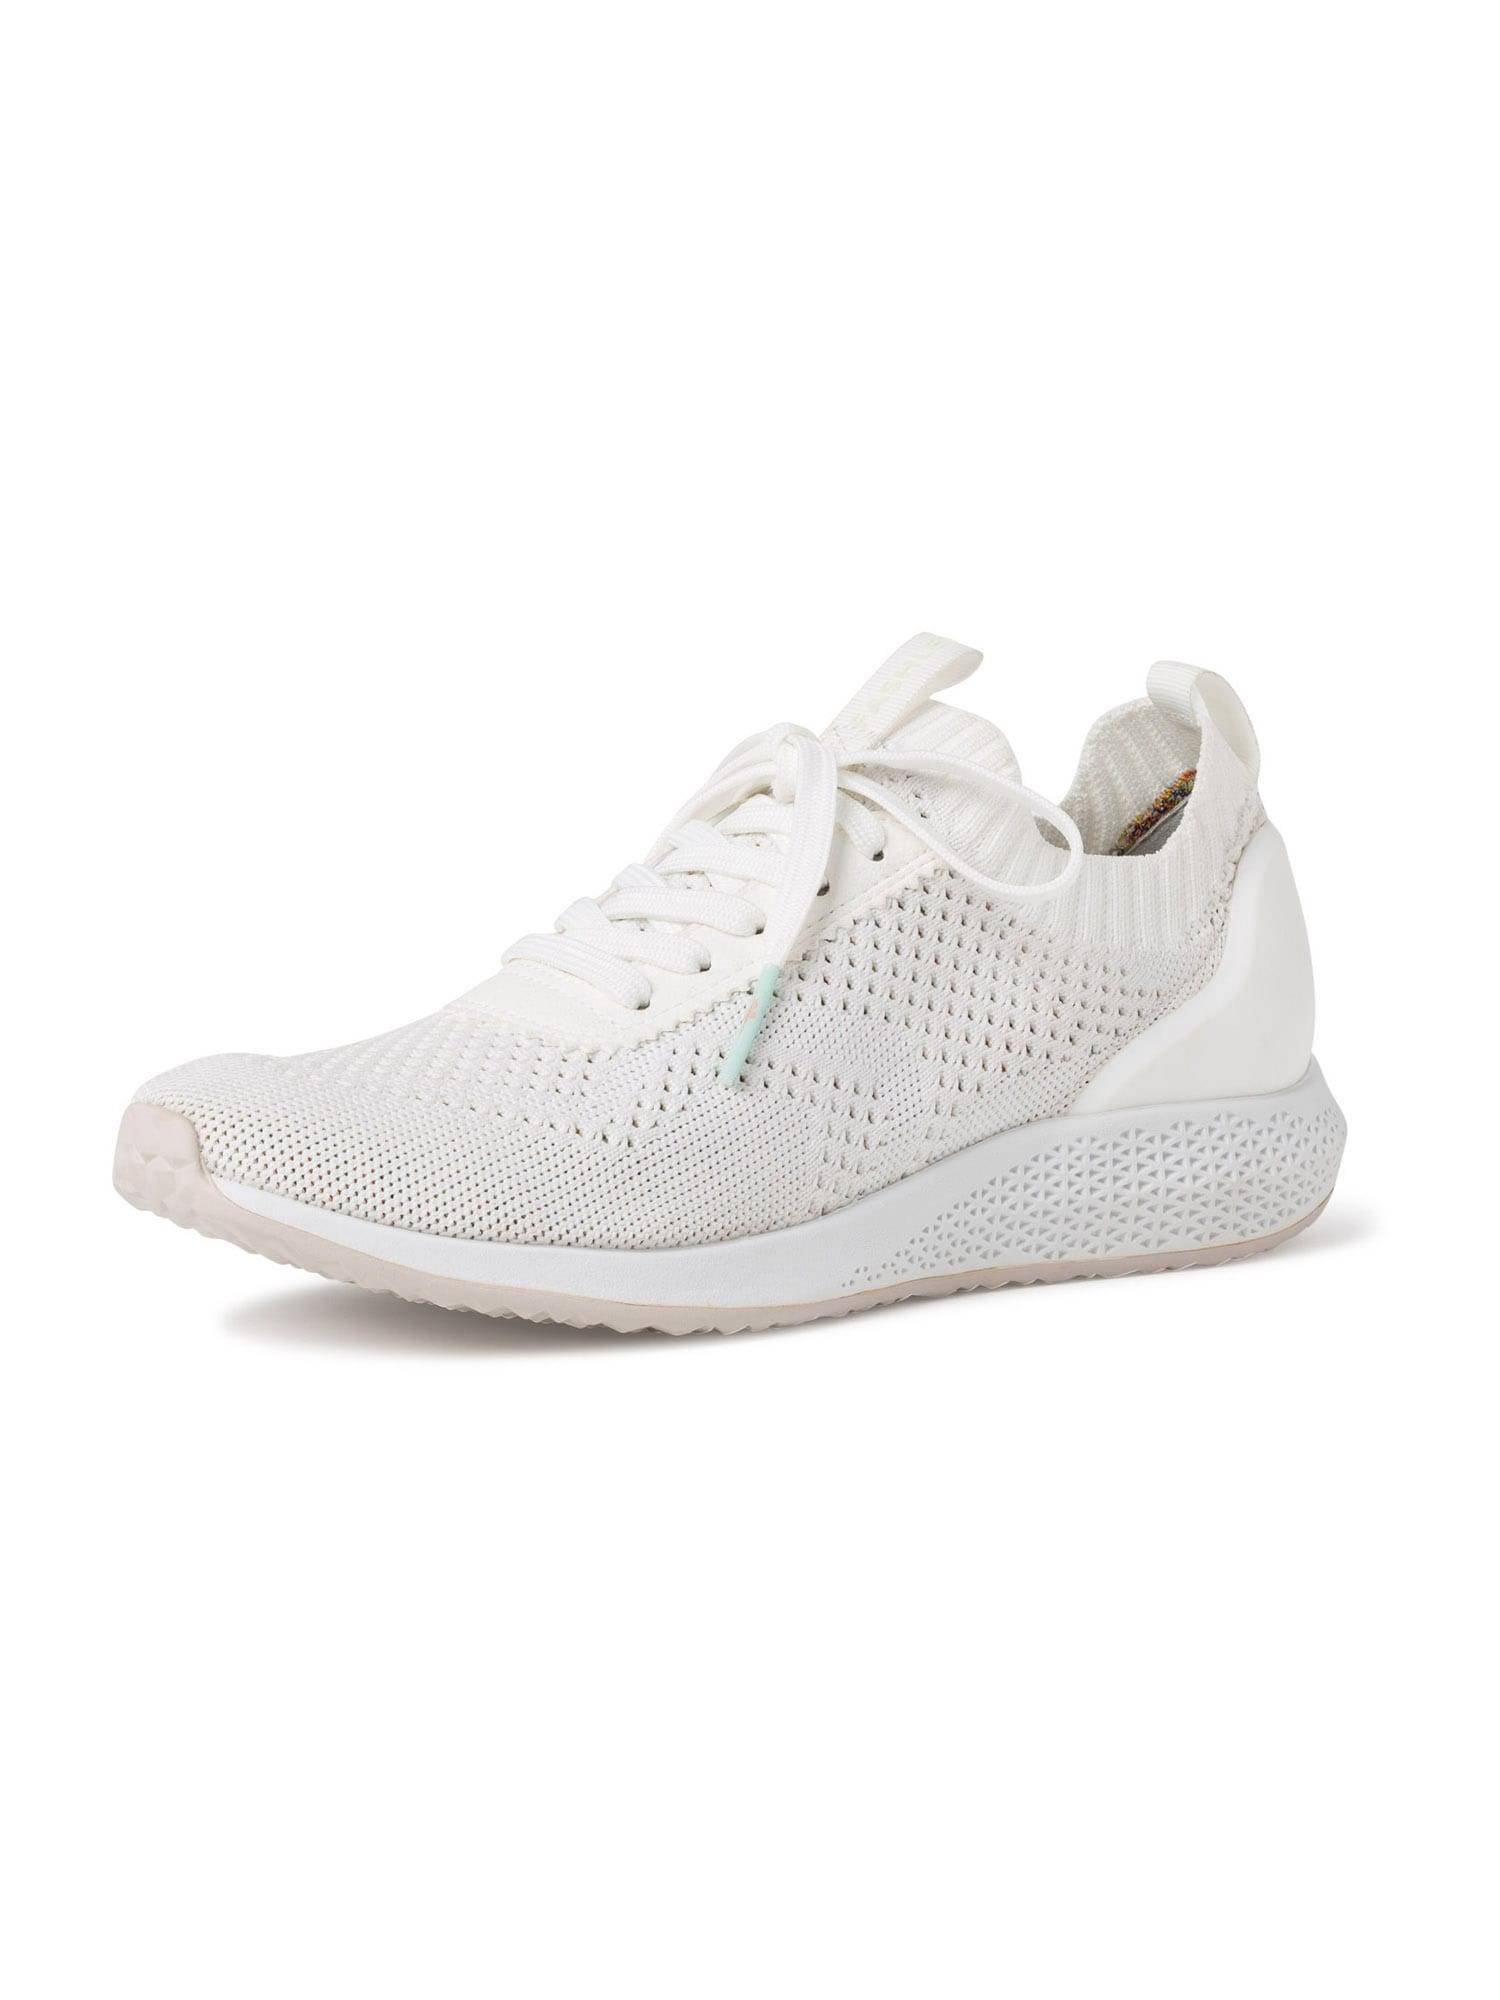 TAMARIS Baskets basses  - Blanc - Taille: 42 - female